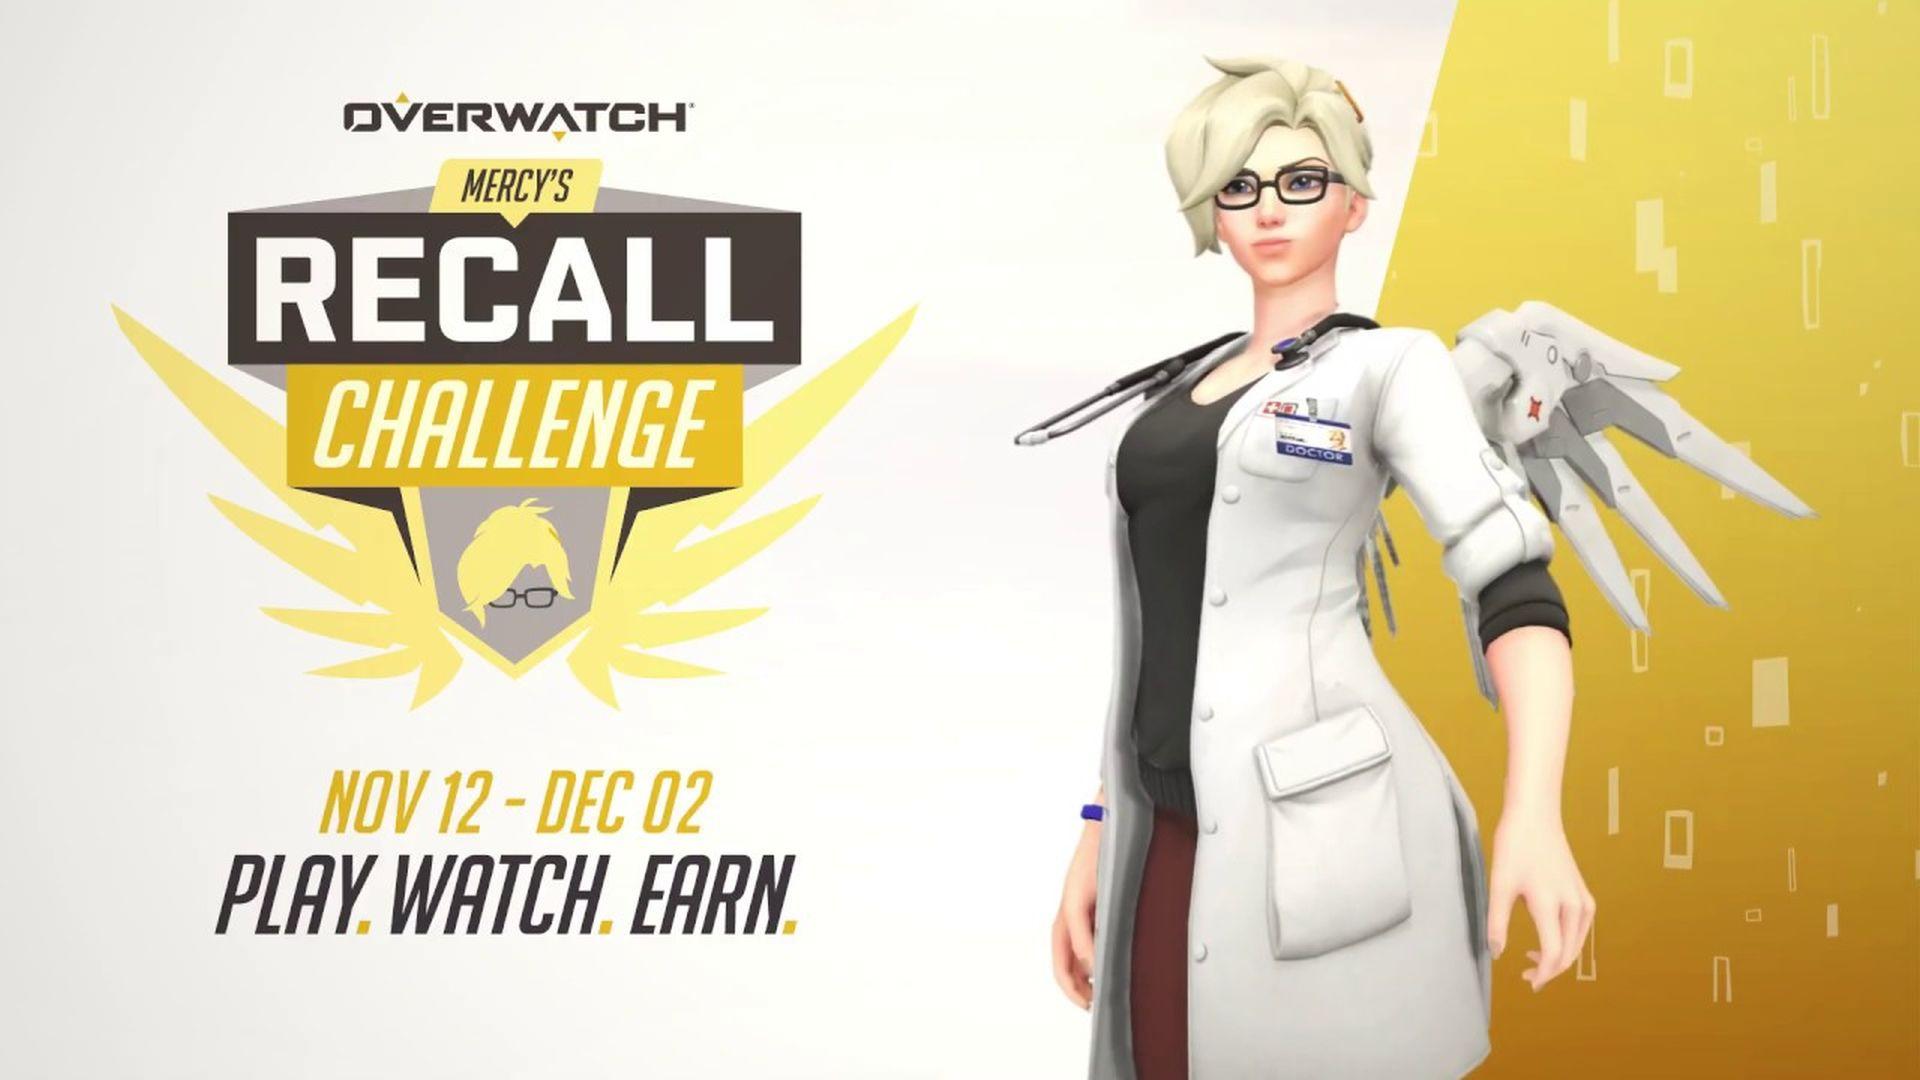 Overwatch - Mercy's Recall Challenge_01